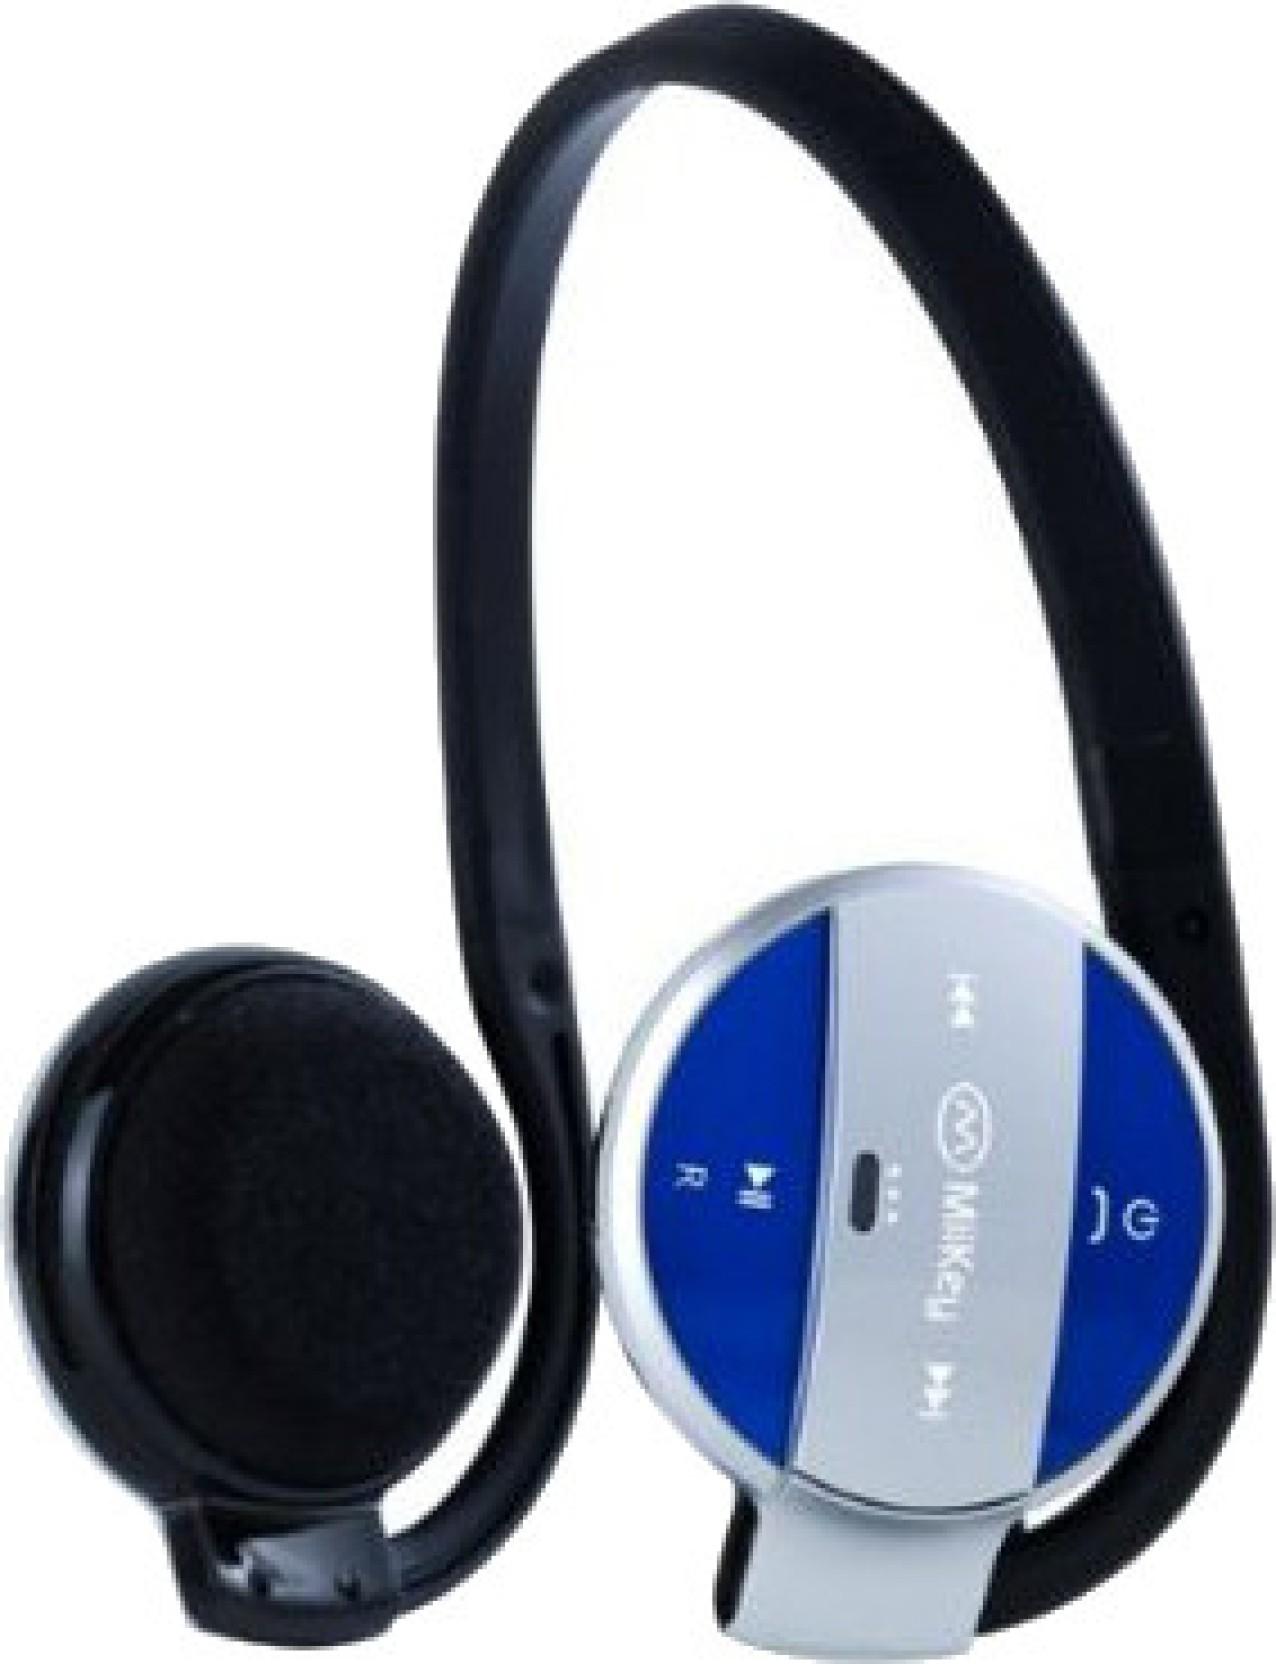 miikey miisports bluetooth headset miikey. Black Bedroom Furniture Sets. Home Design Ideas